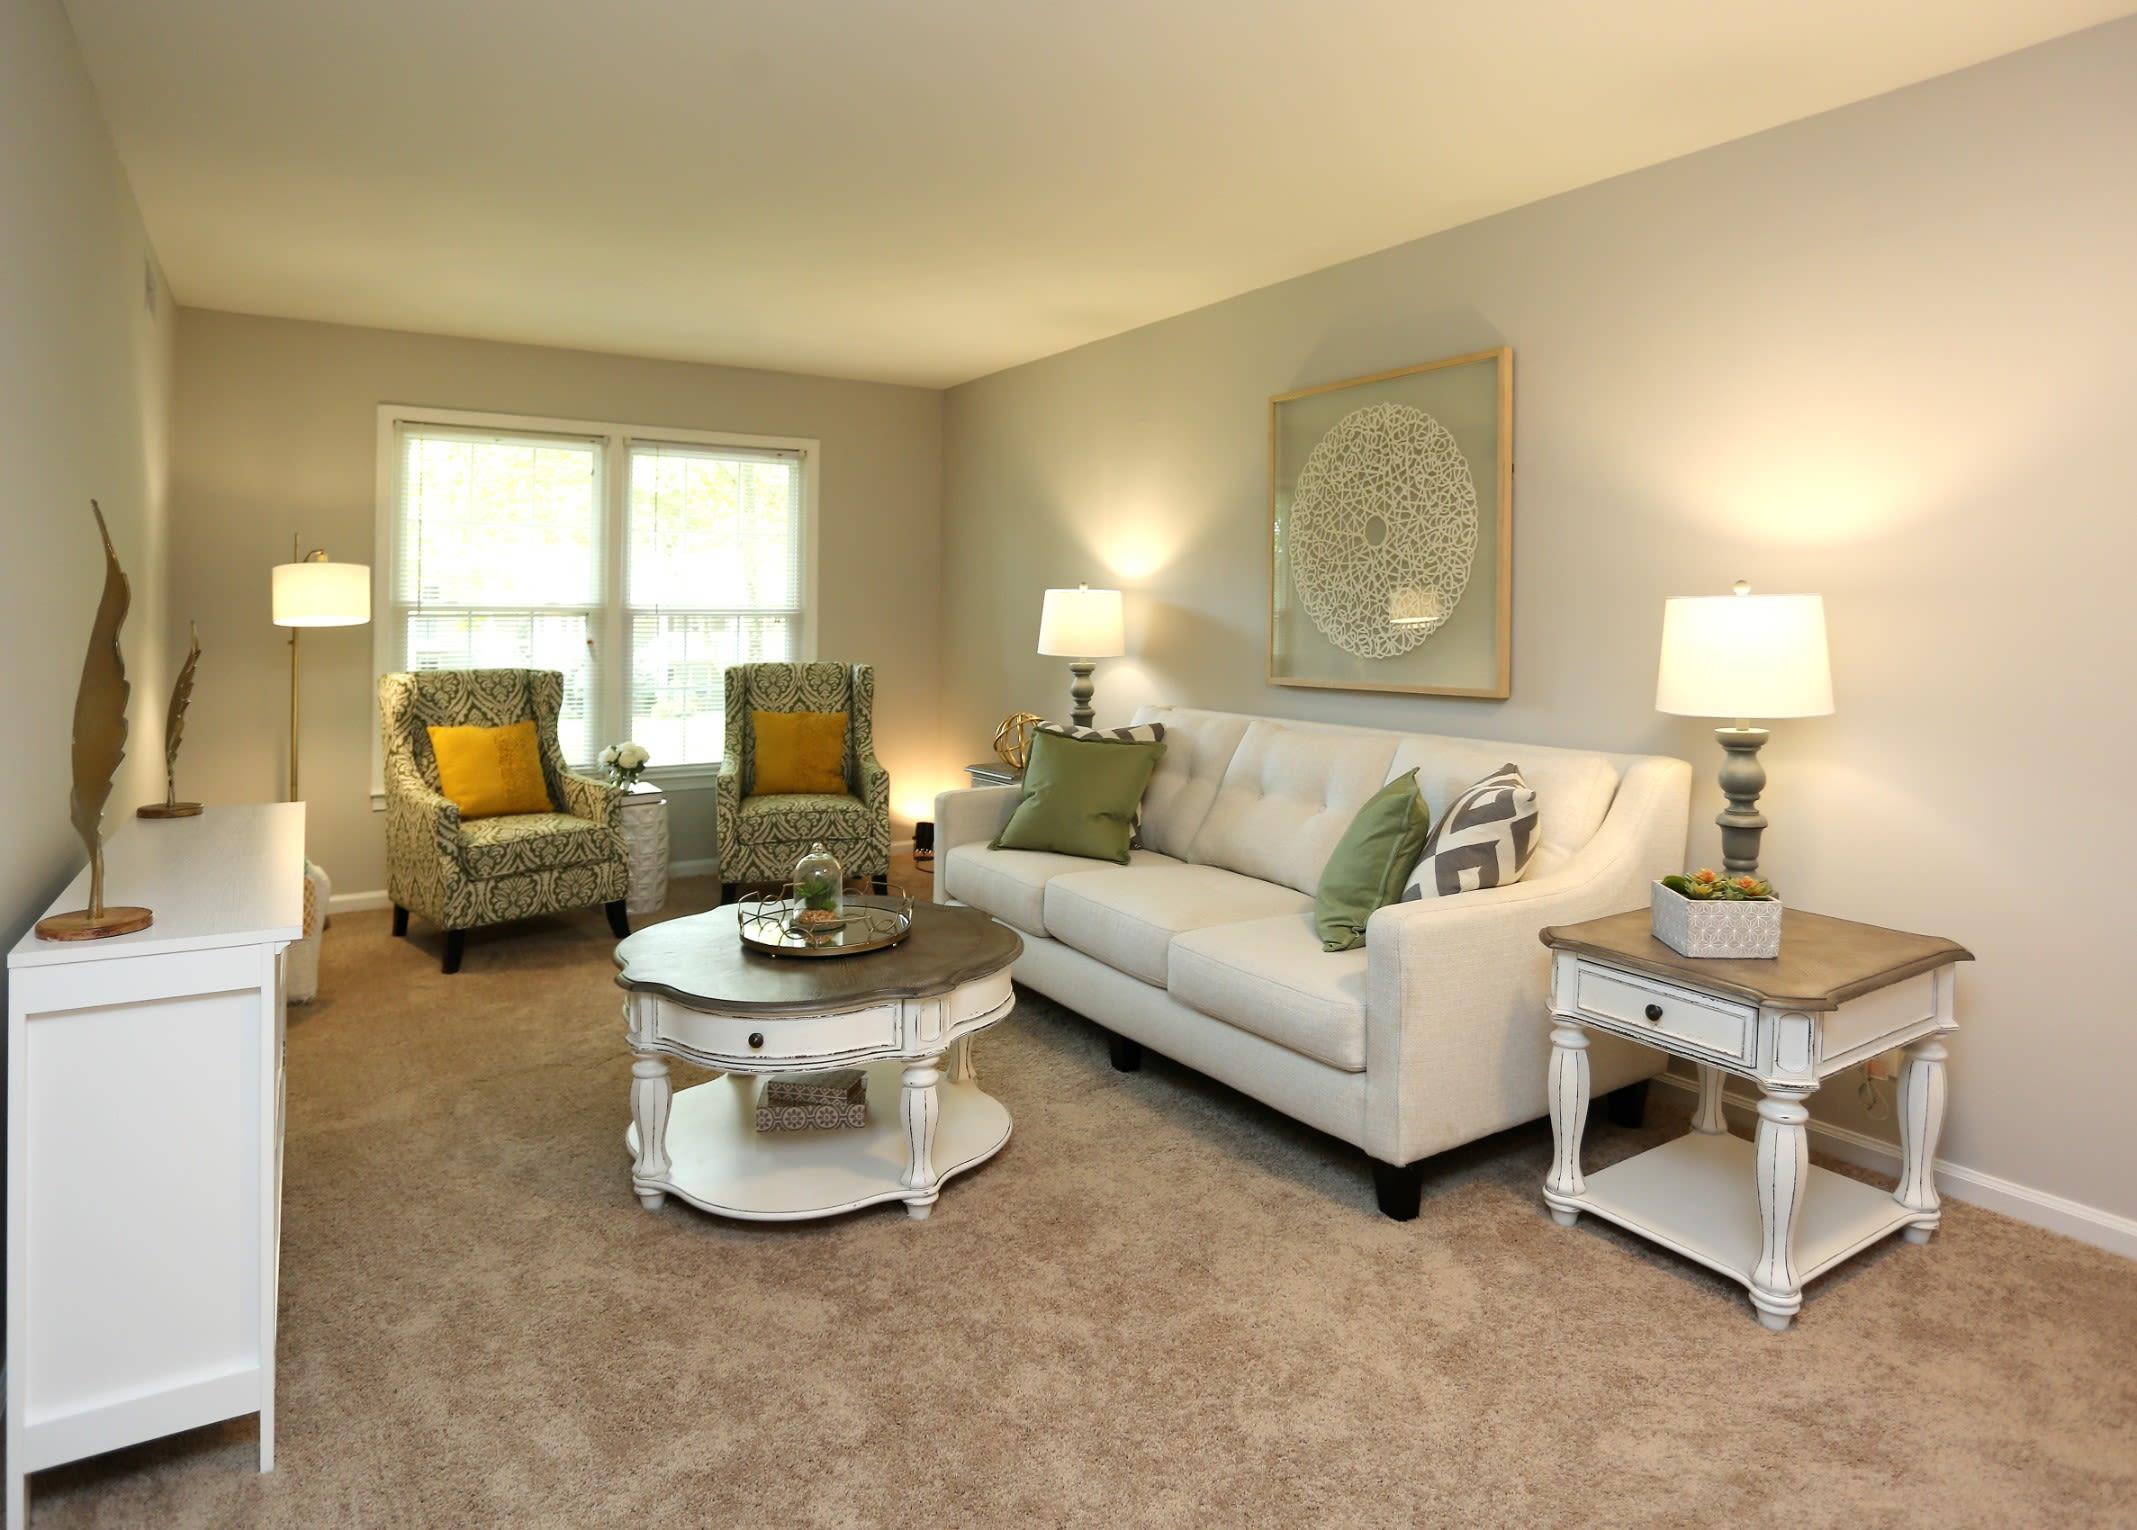 Model Interior at Greensboro, NC Apartments